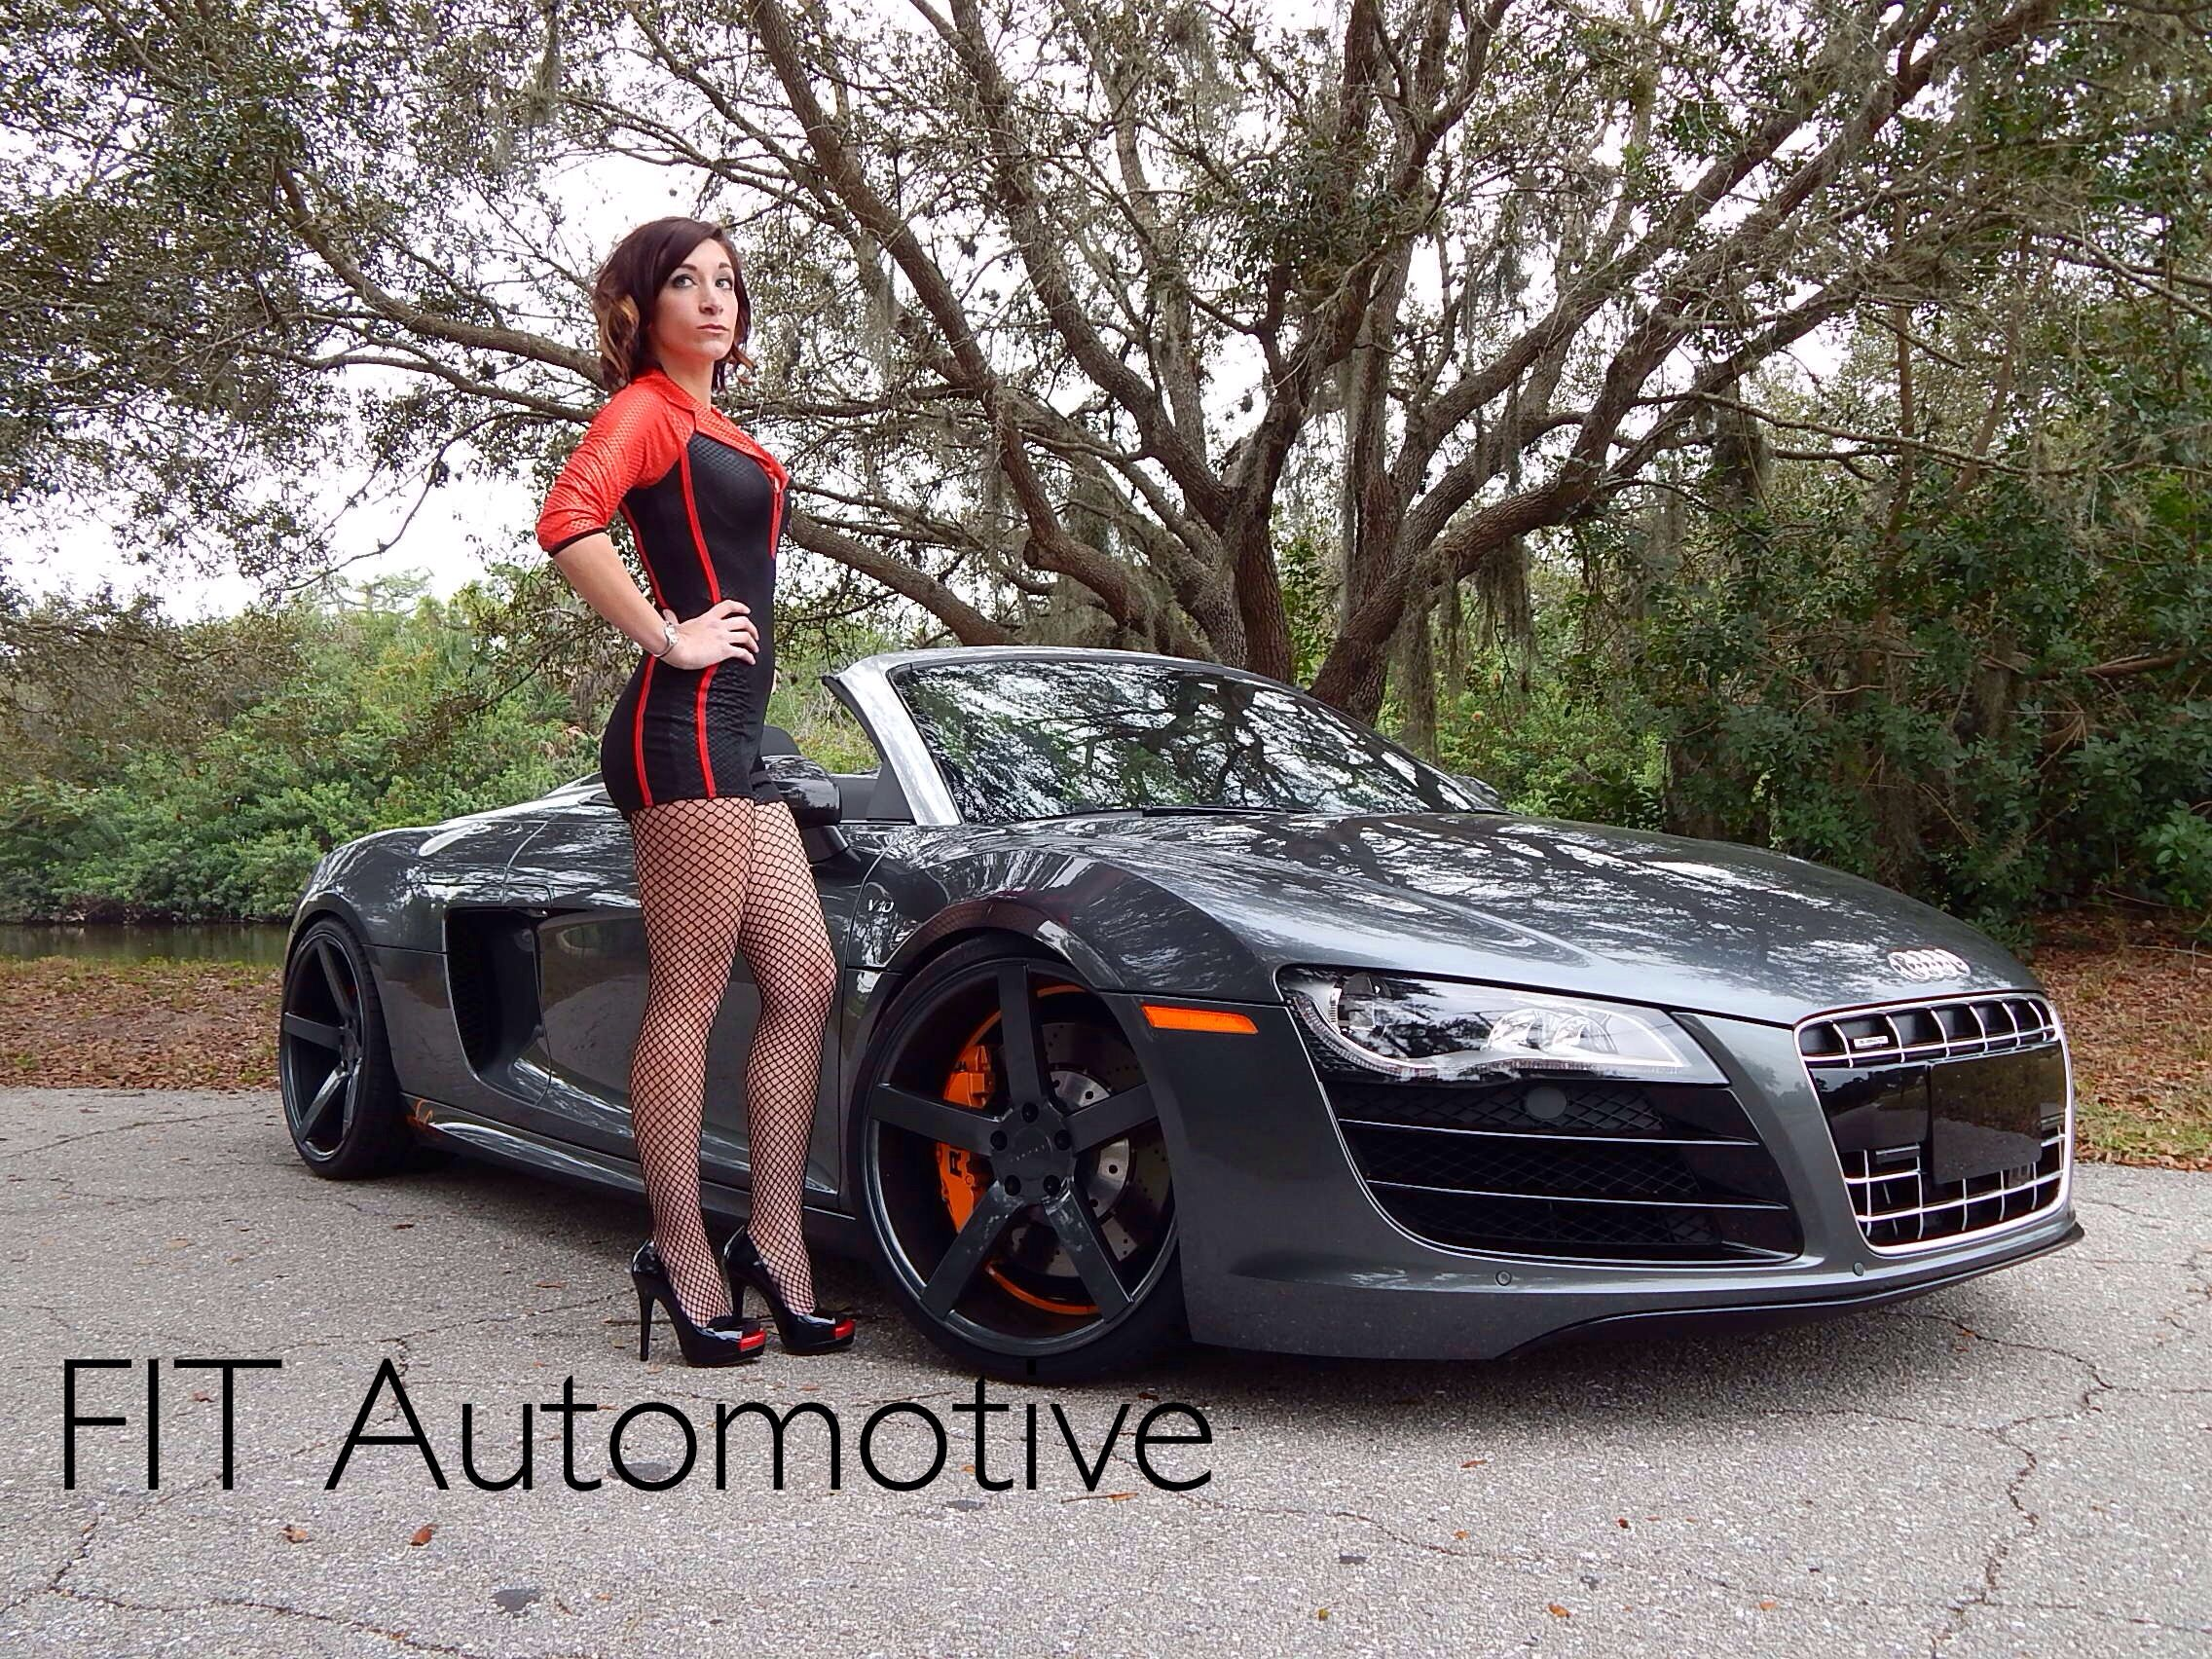 Cars and girls hotgirl car audi audir8 fastcars carmodel